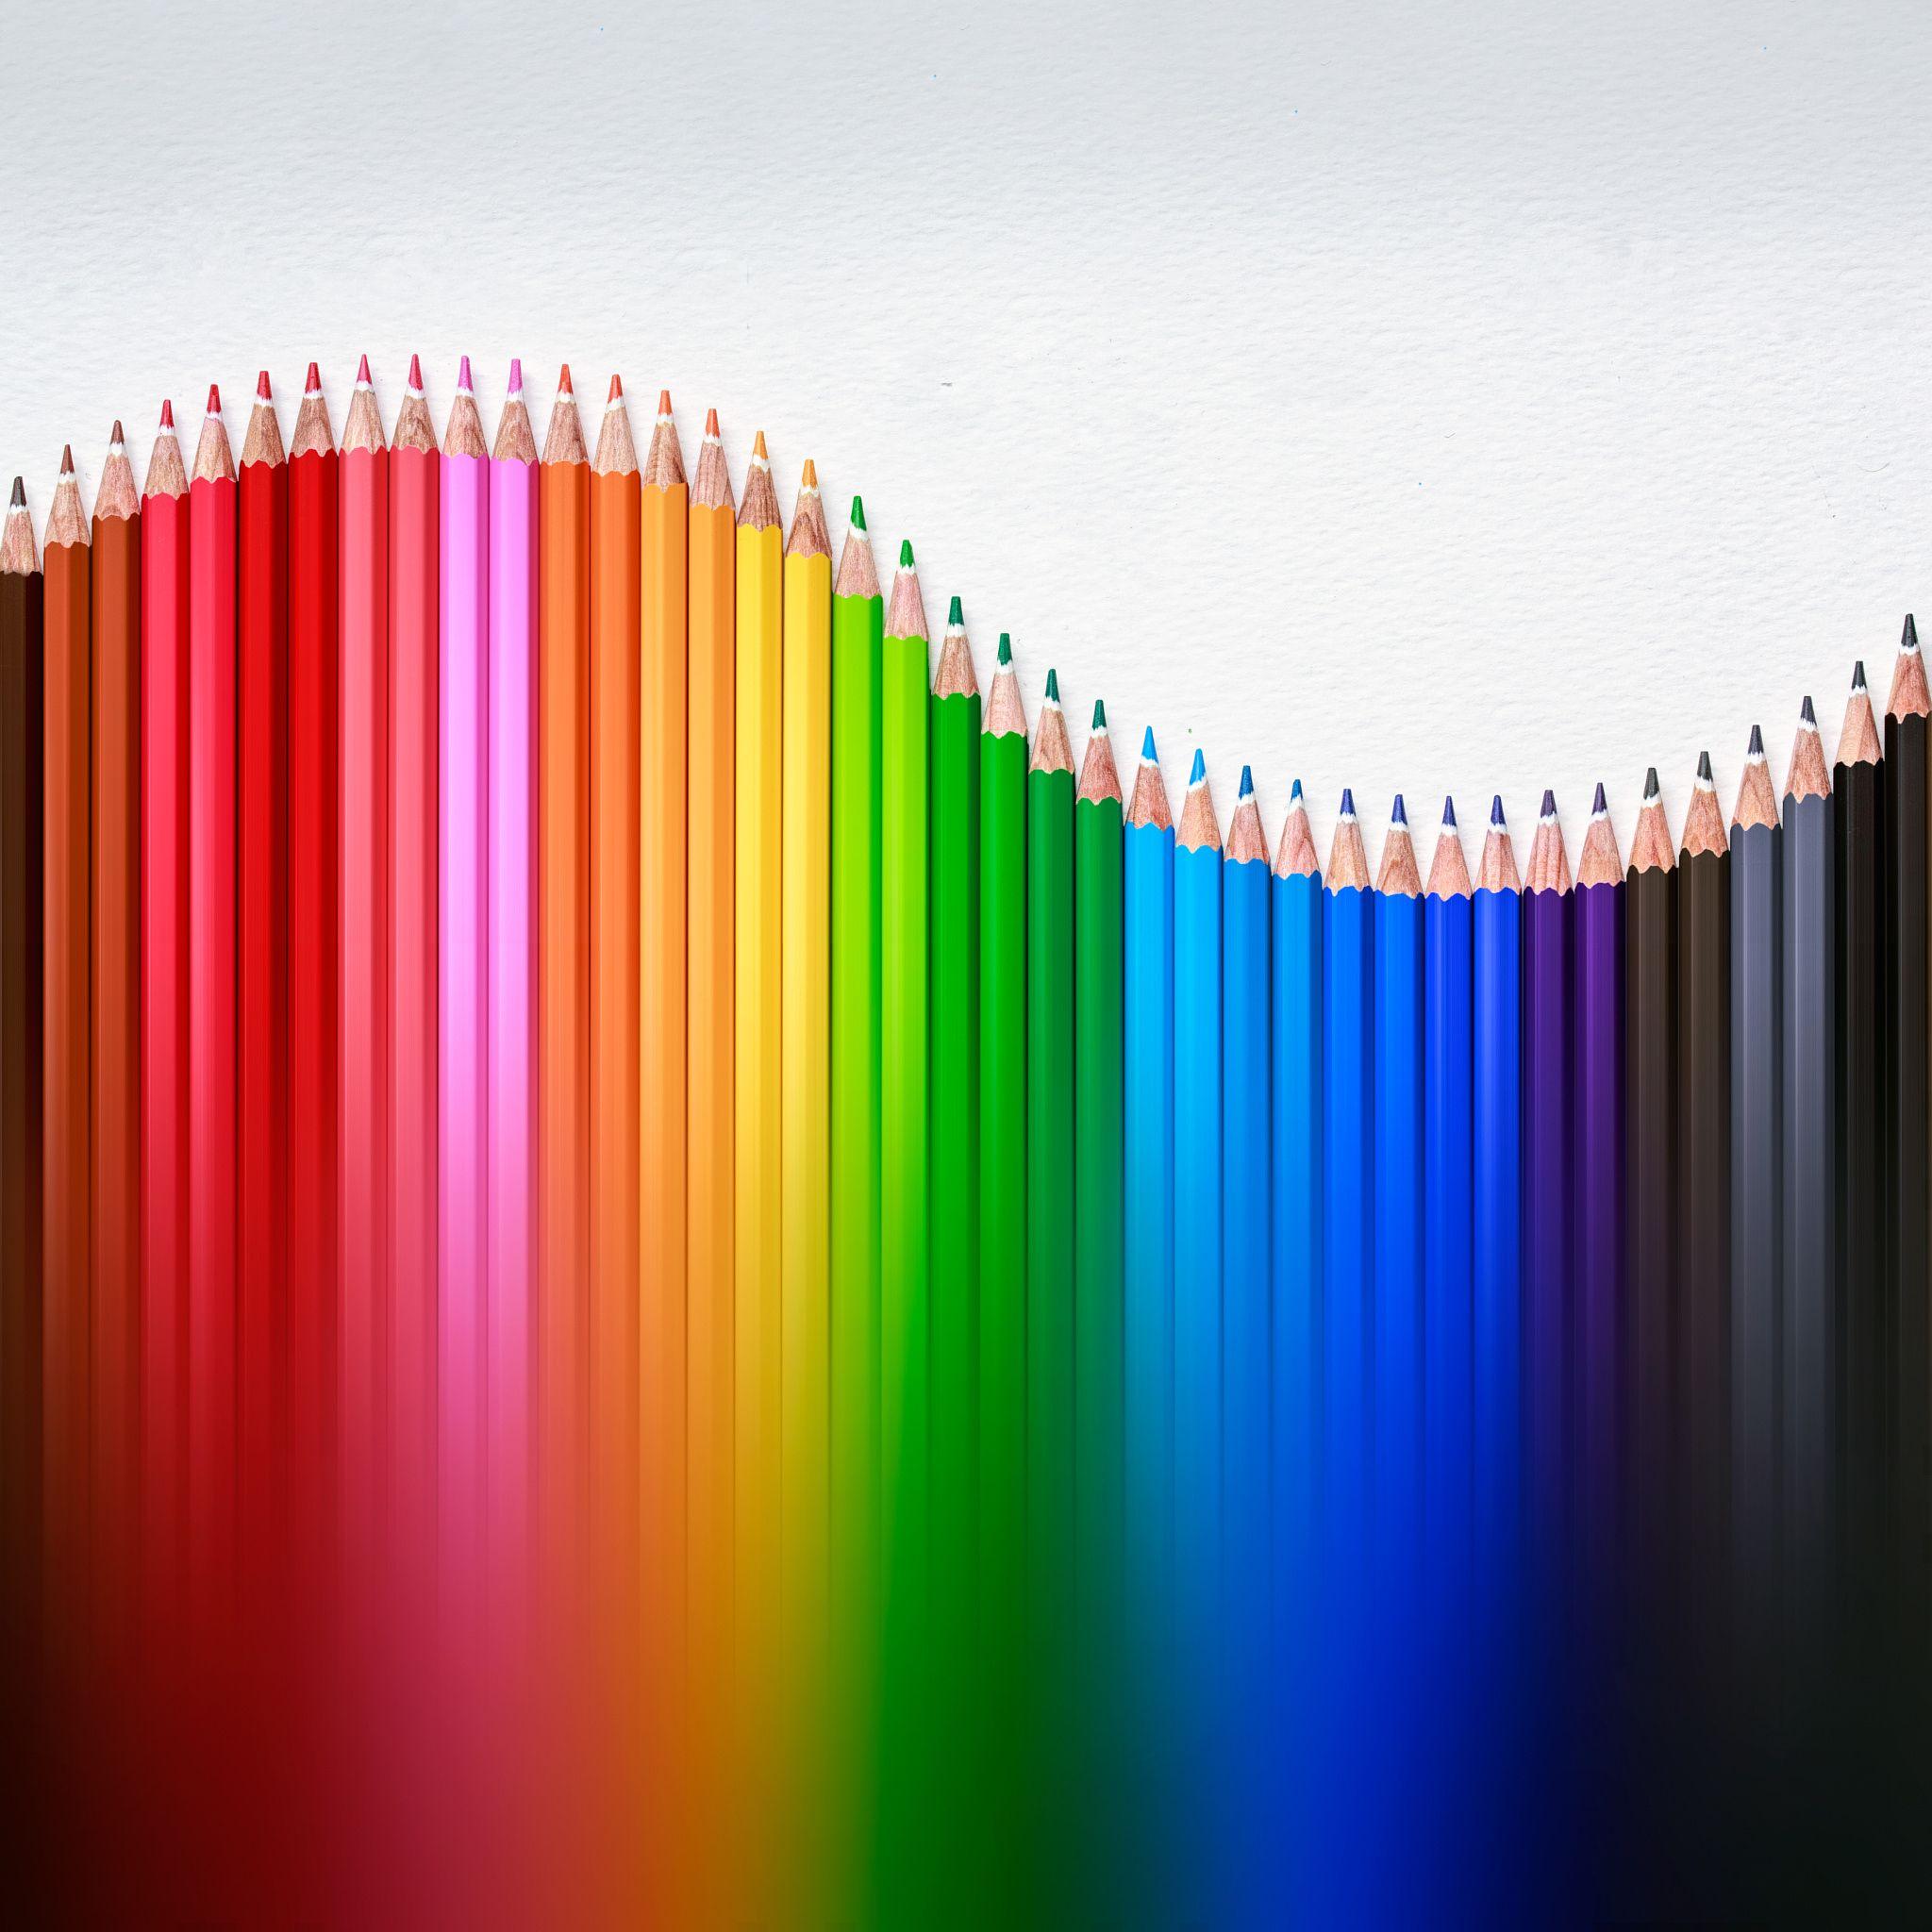 Colour Run by Gerard McAuliffe on 500px